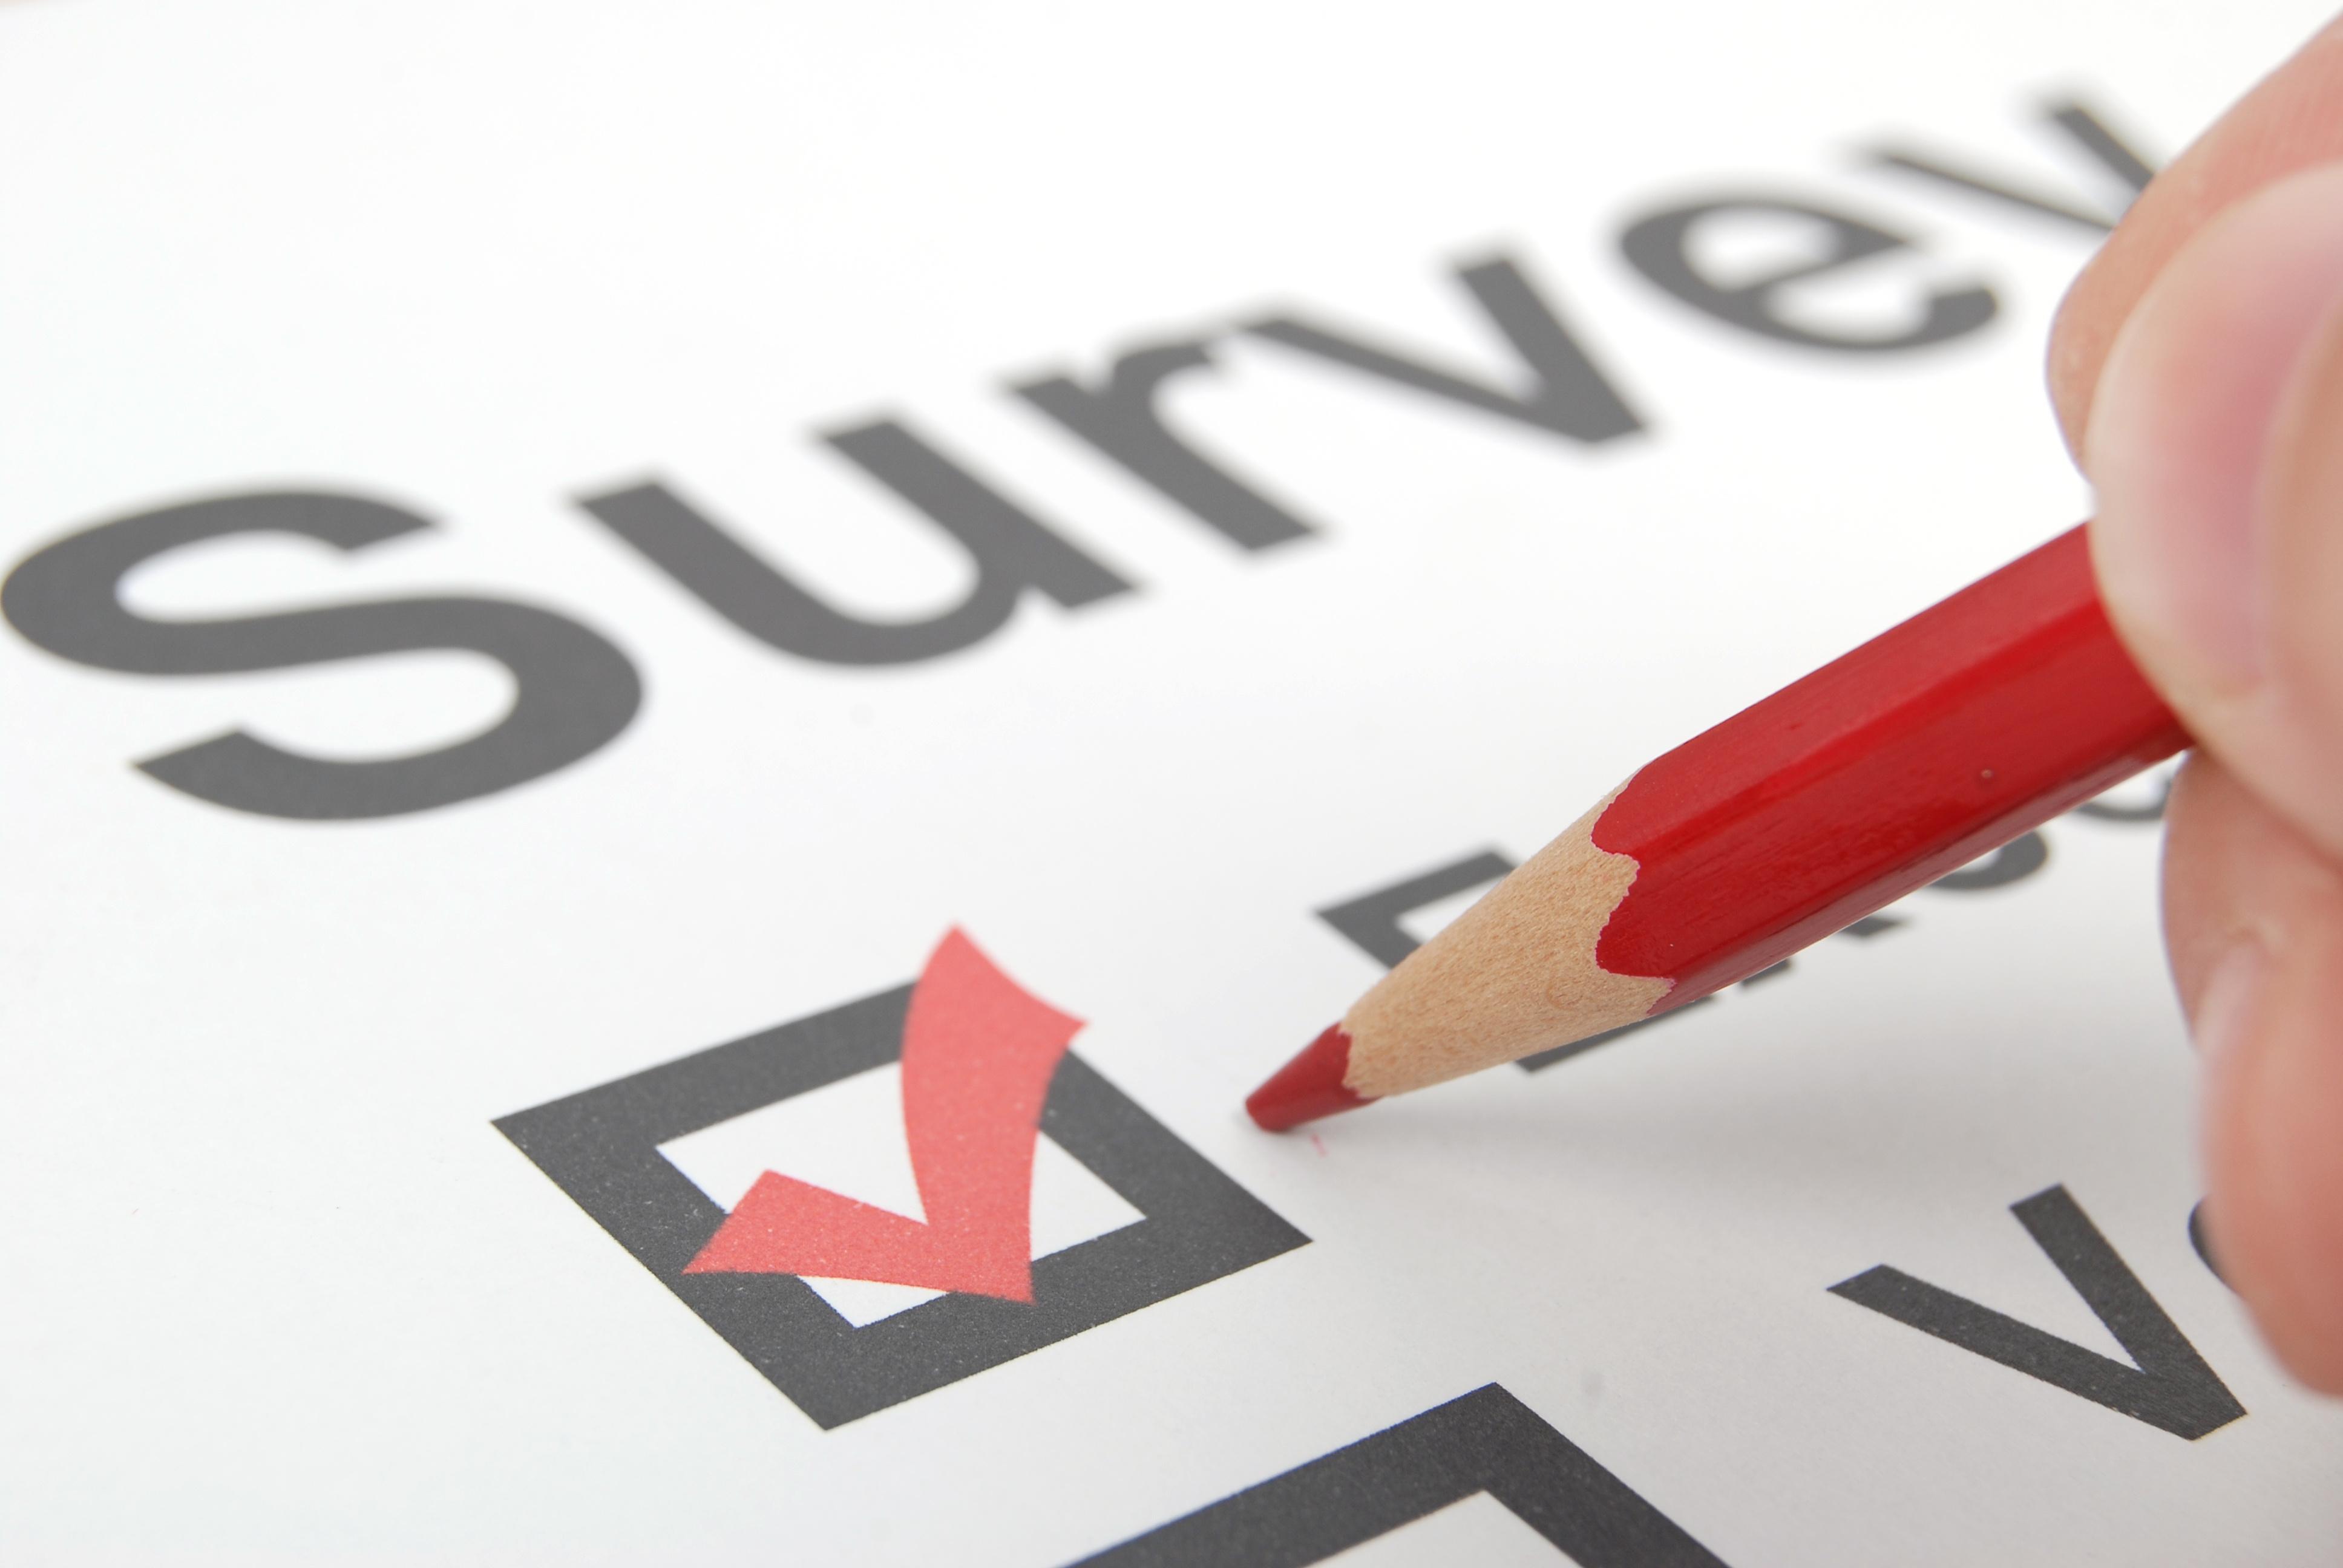 Comprehensive Needs Assessment Survey